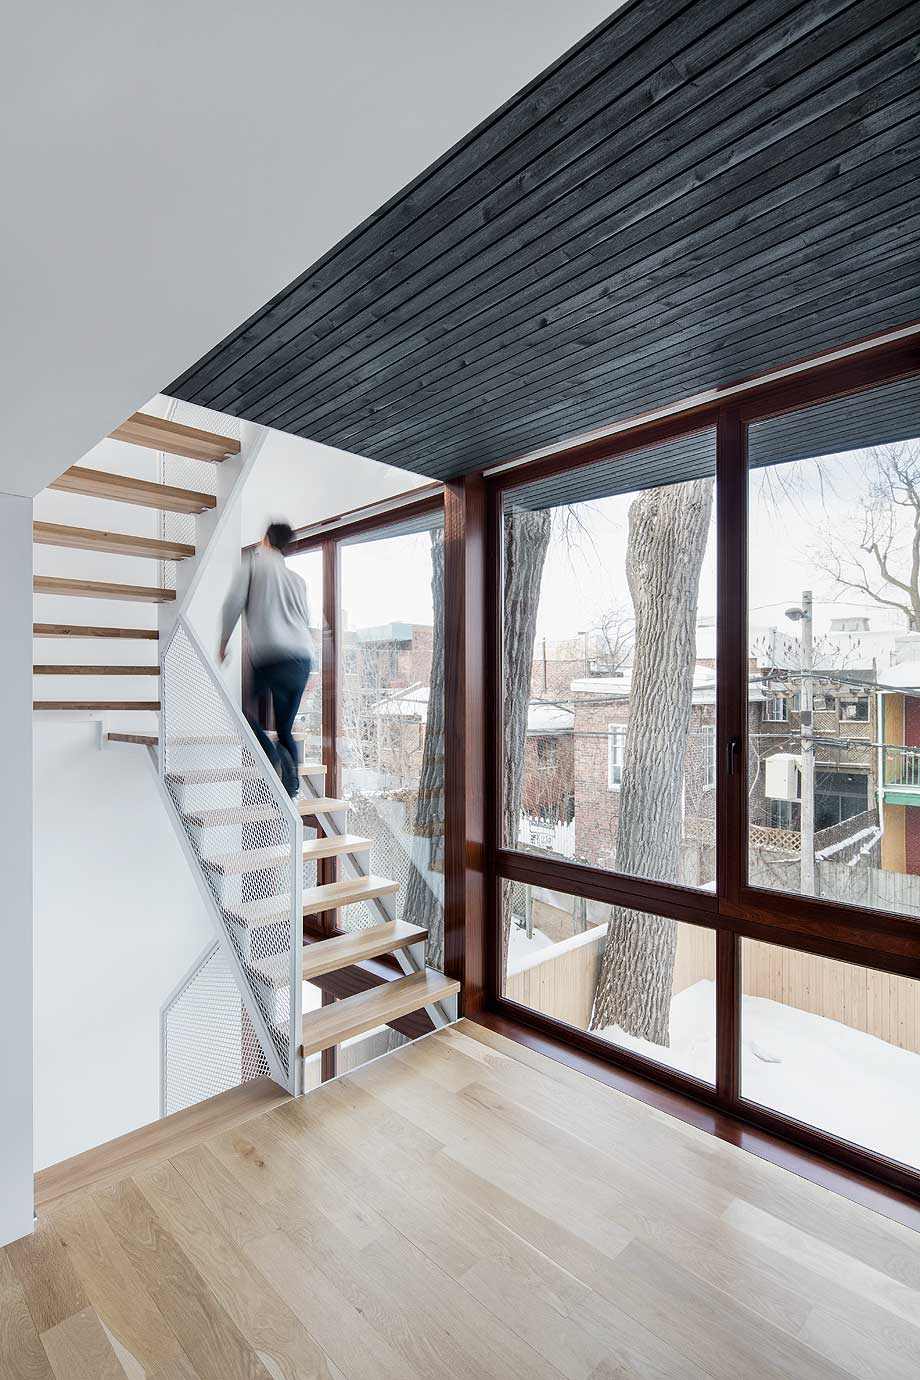 hotel-de-ville-residence-architecture-microclimat (5)